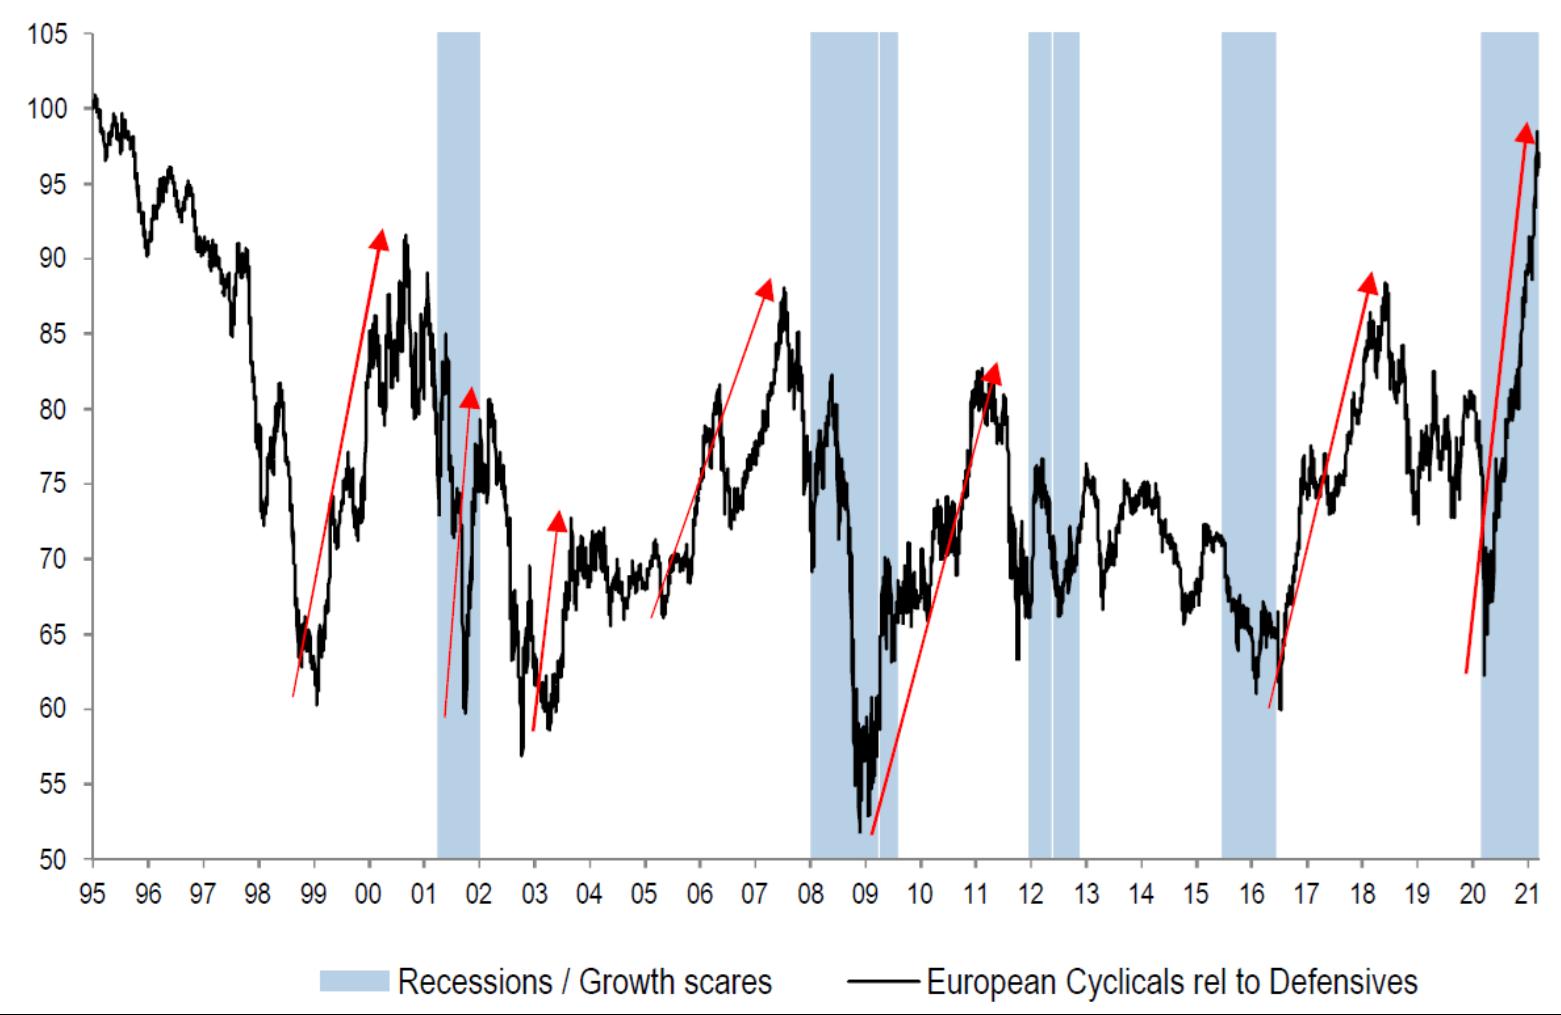 Cyclicals At Long Term Highs Versus Defensives